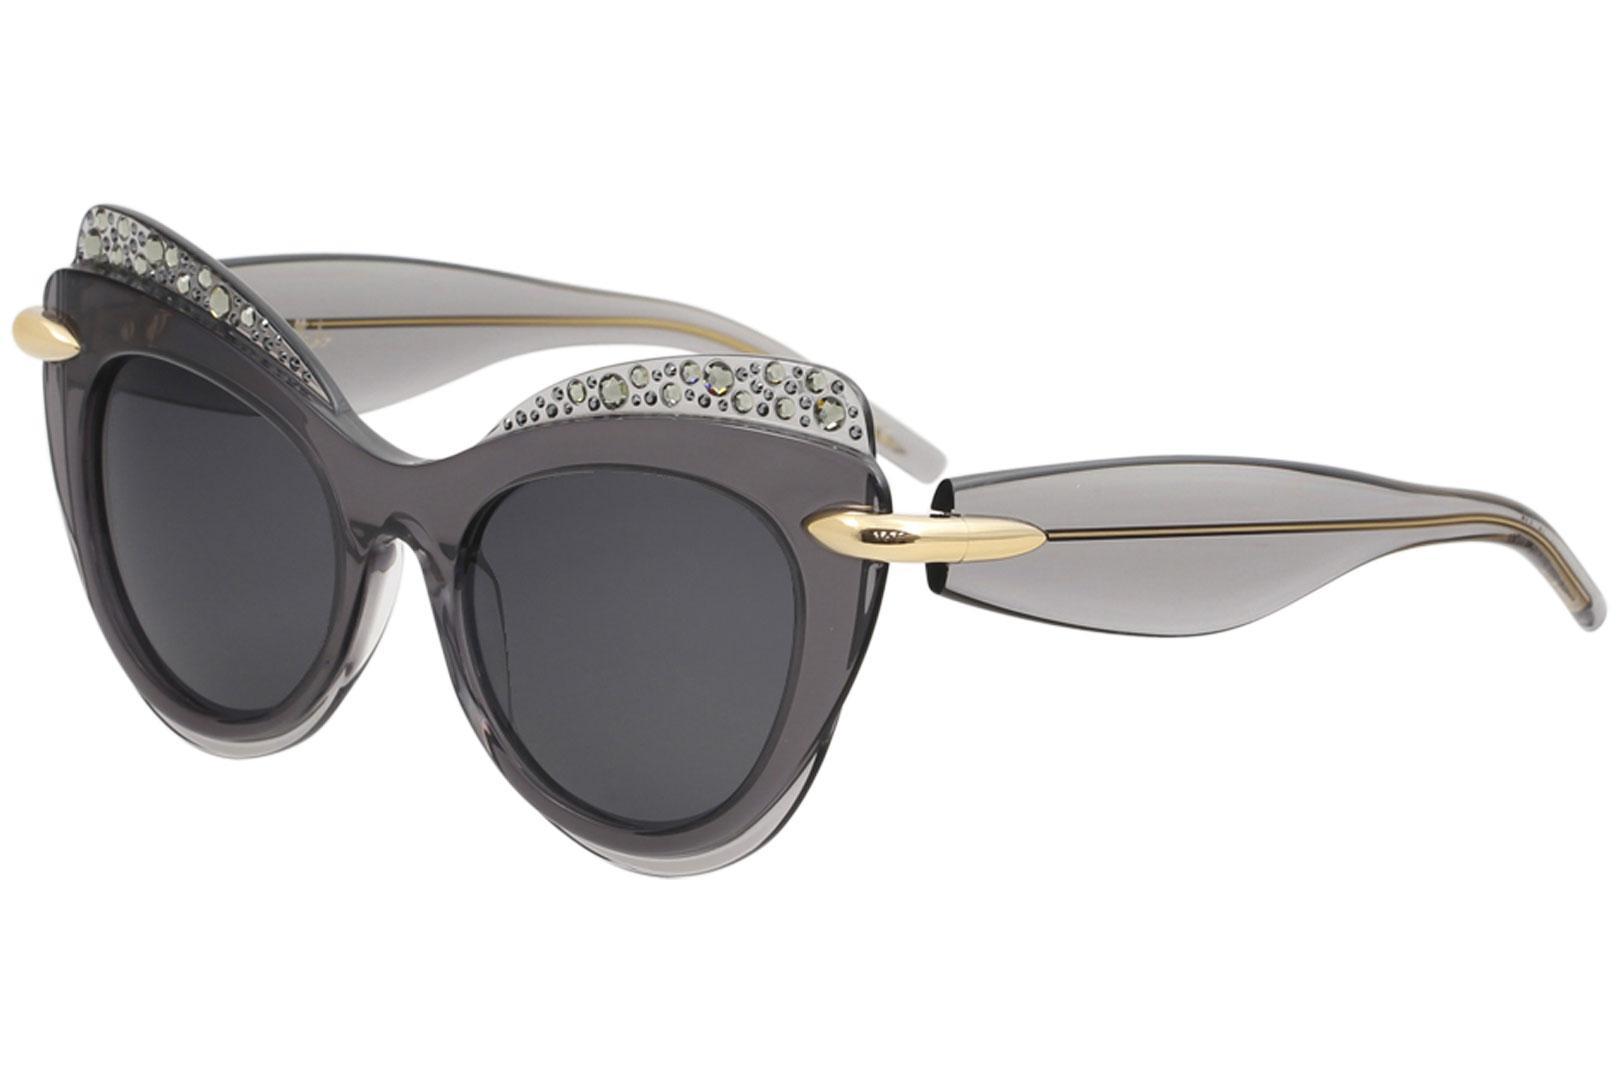 Image of Pomellato Women's PM0002S PM/0002/S Fashion Cat Eye Sunglasses - Grey - Lens 51 Bridge 19 Temple 140mm